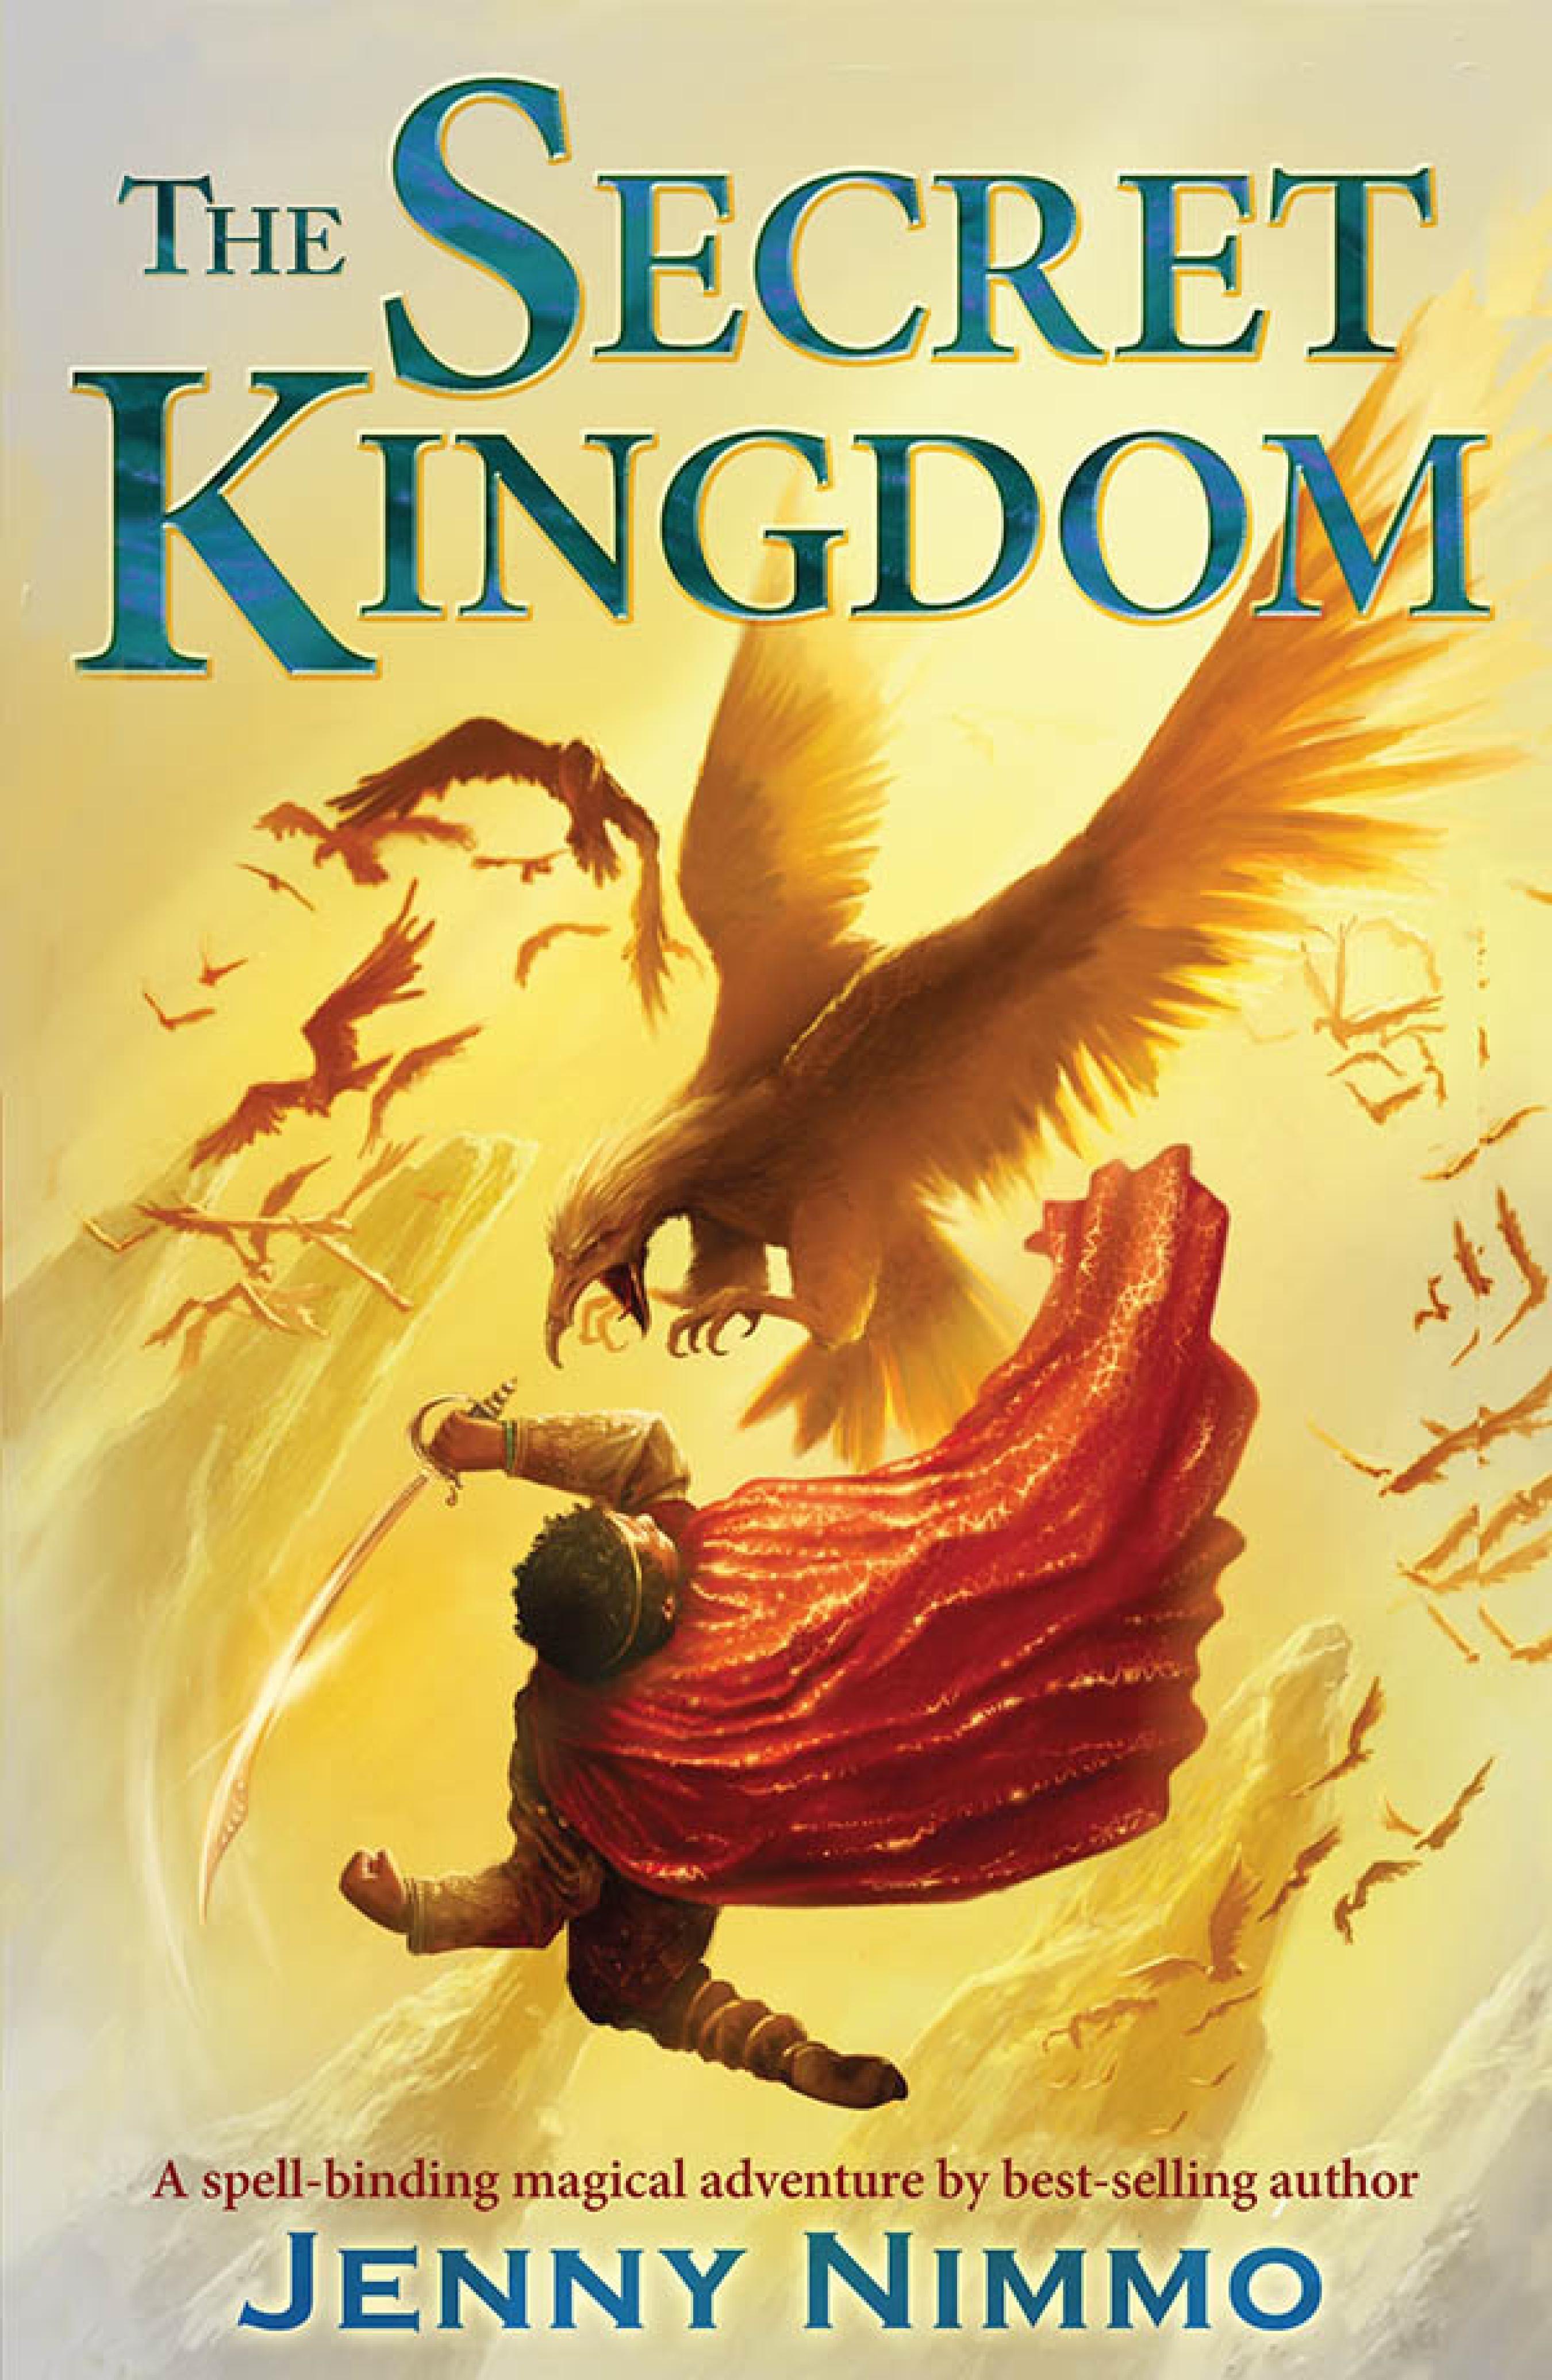 The Secret Kingdom (ebook)jenny Nimmo9781780310237